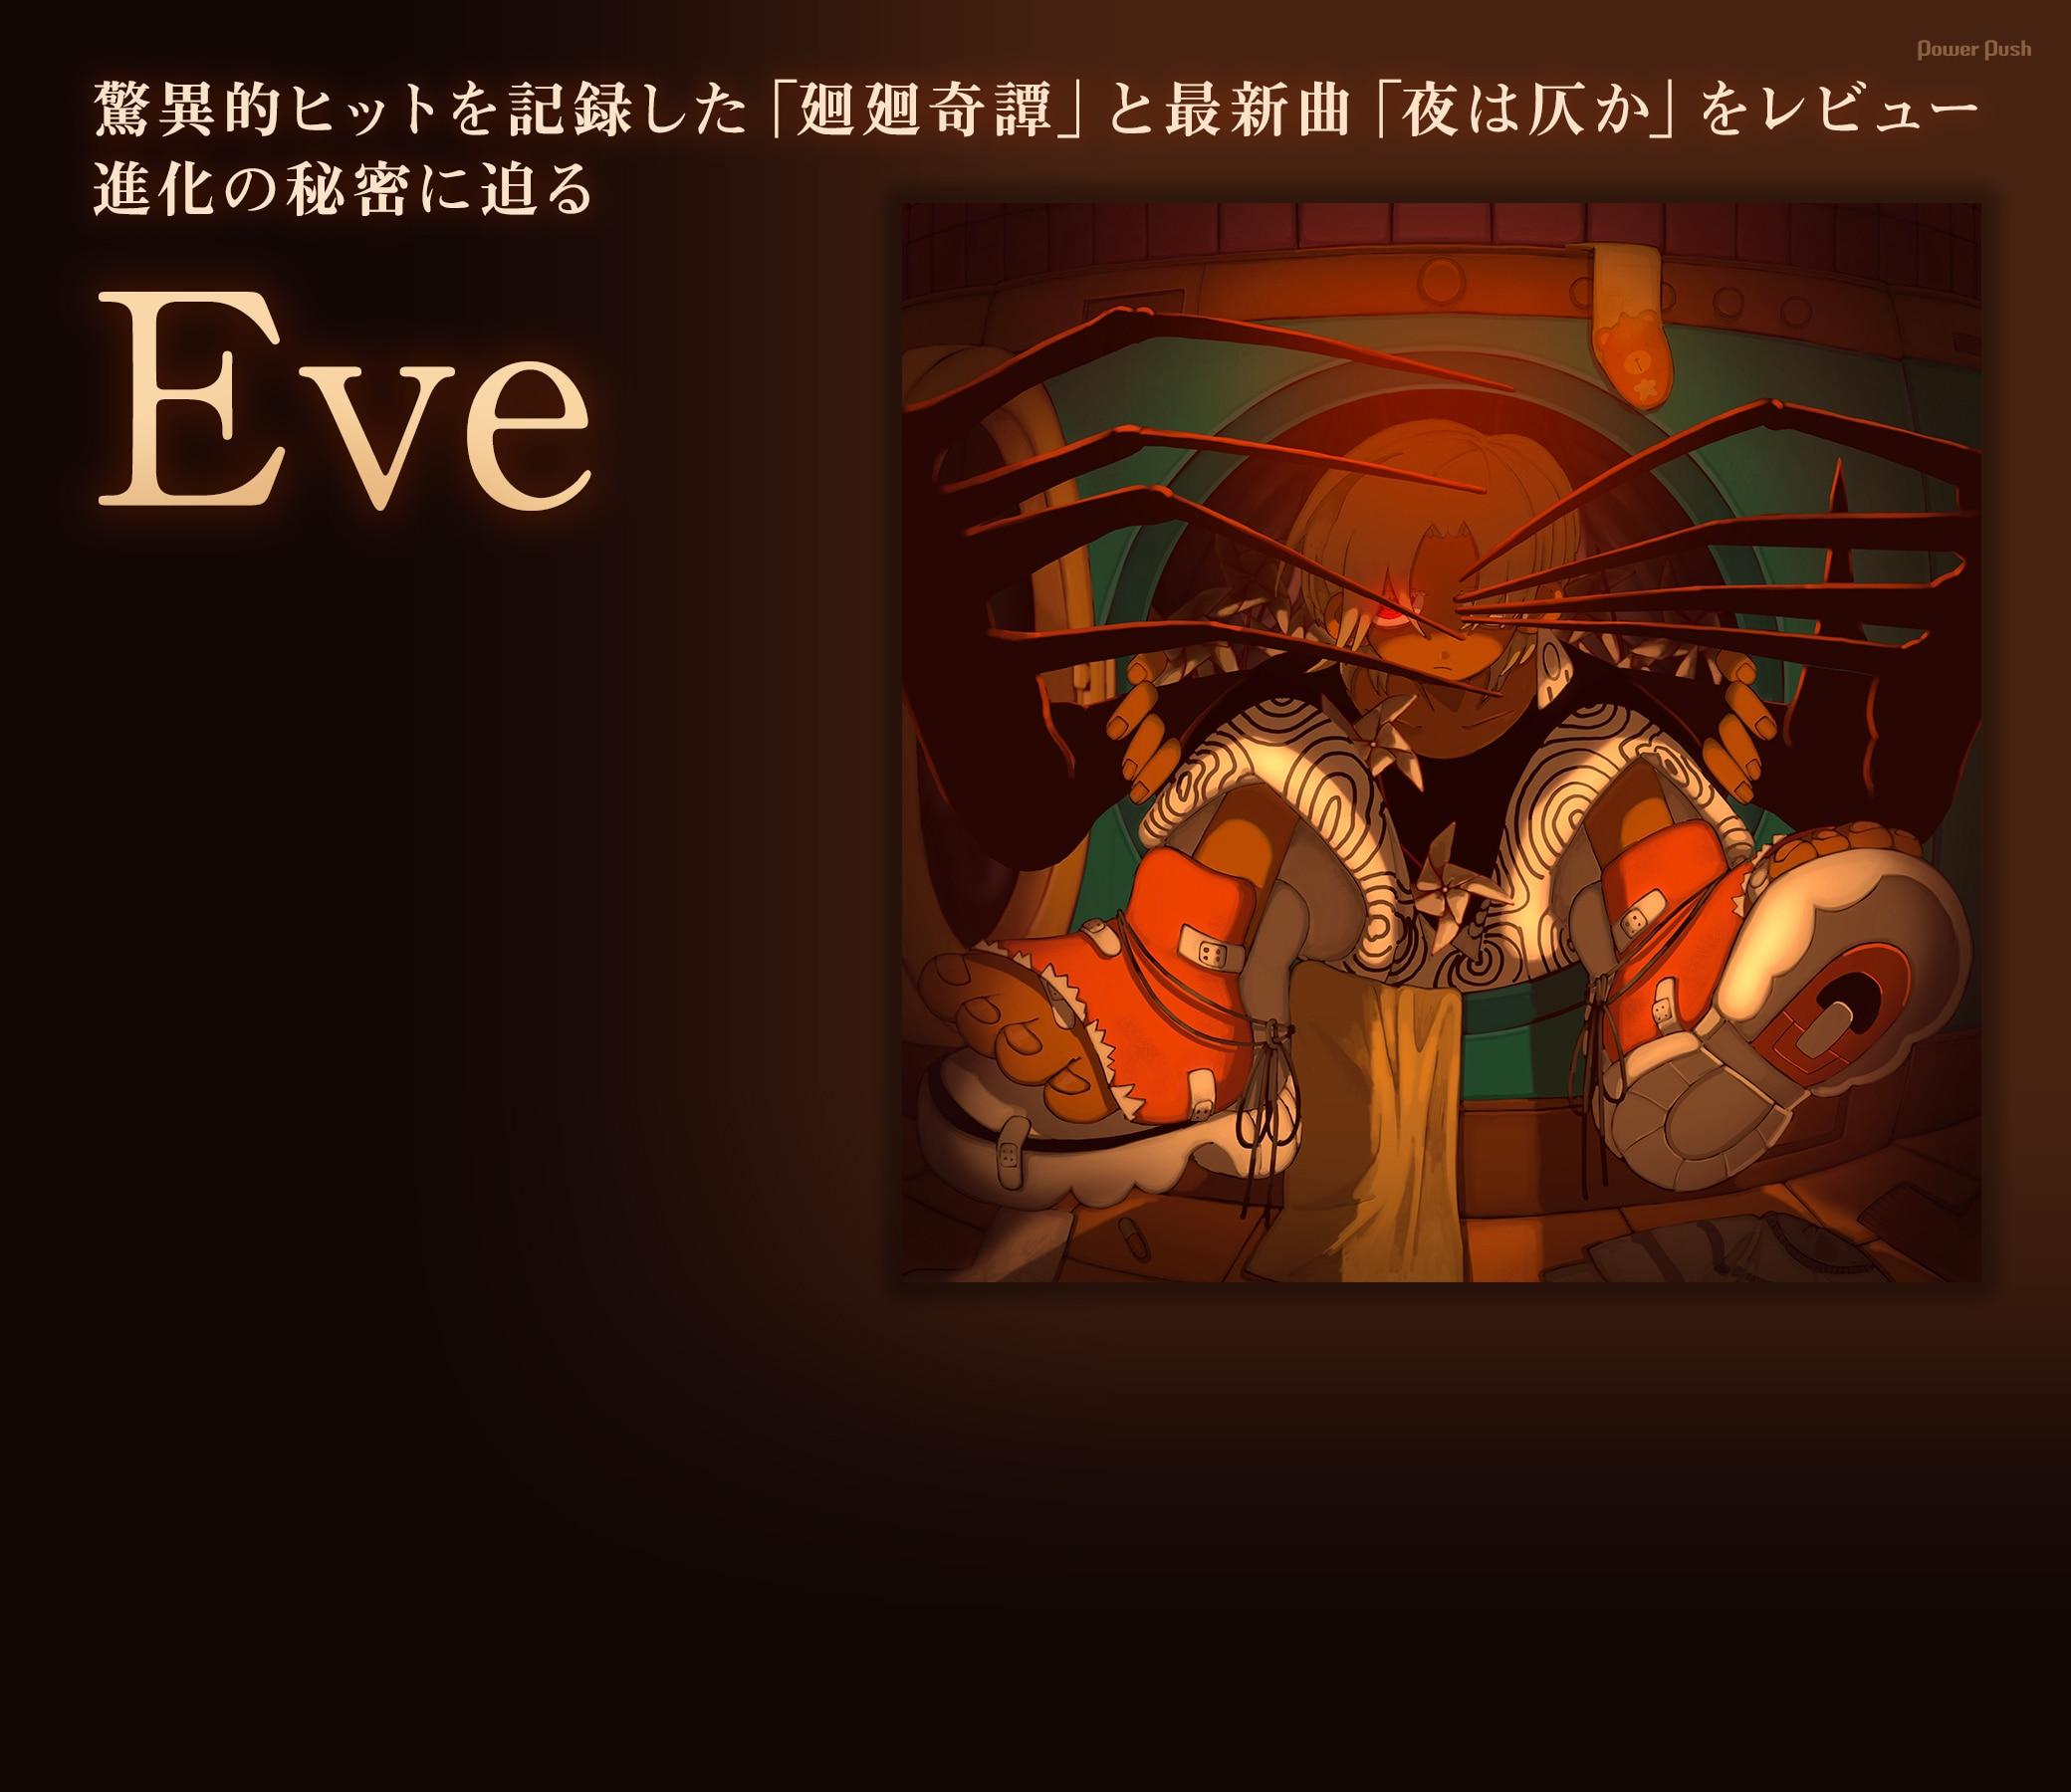 Eve|驚異的ヒットを記録した「廻廻奇譚」と最新曲「夜は仄か」をレビュー 進化の秘密に迫る